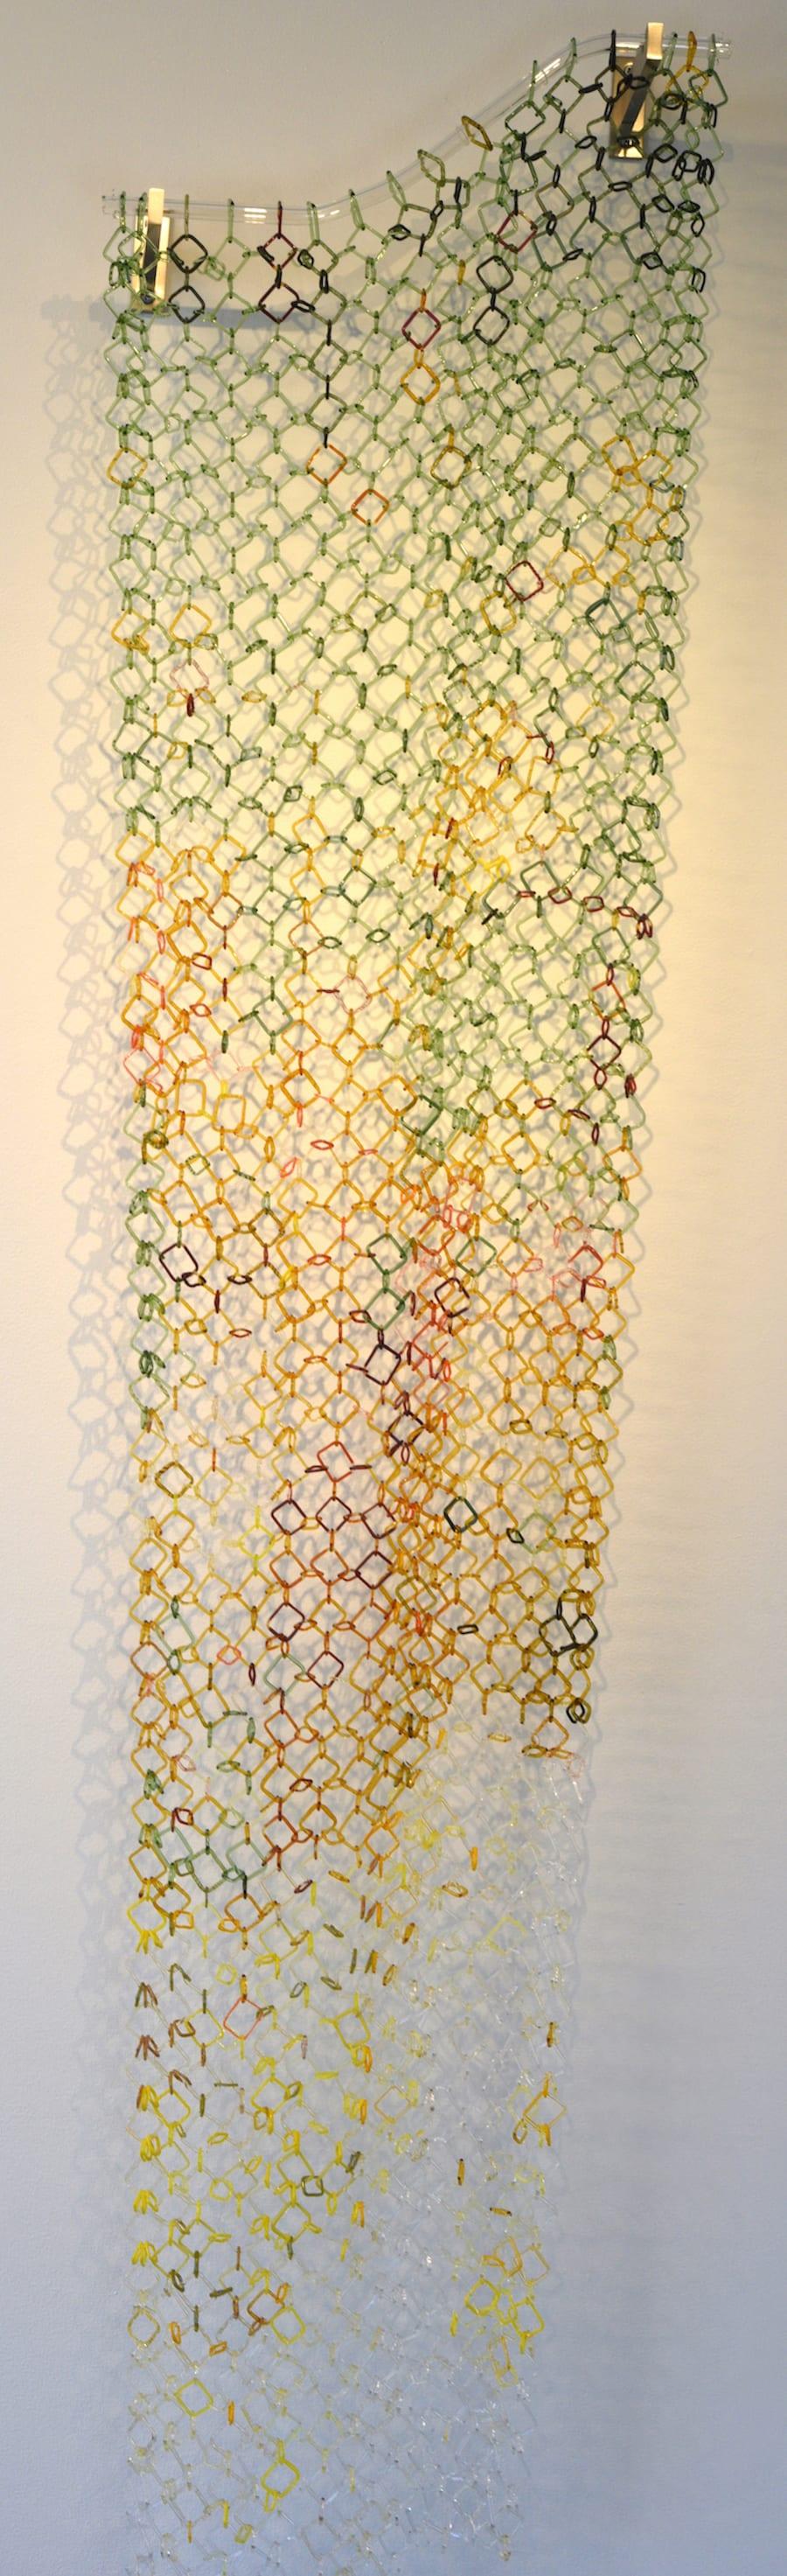 David Licata, Wall Moss, 2020